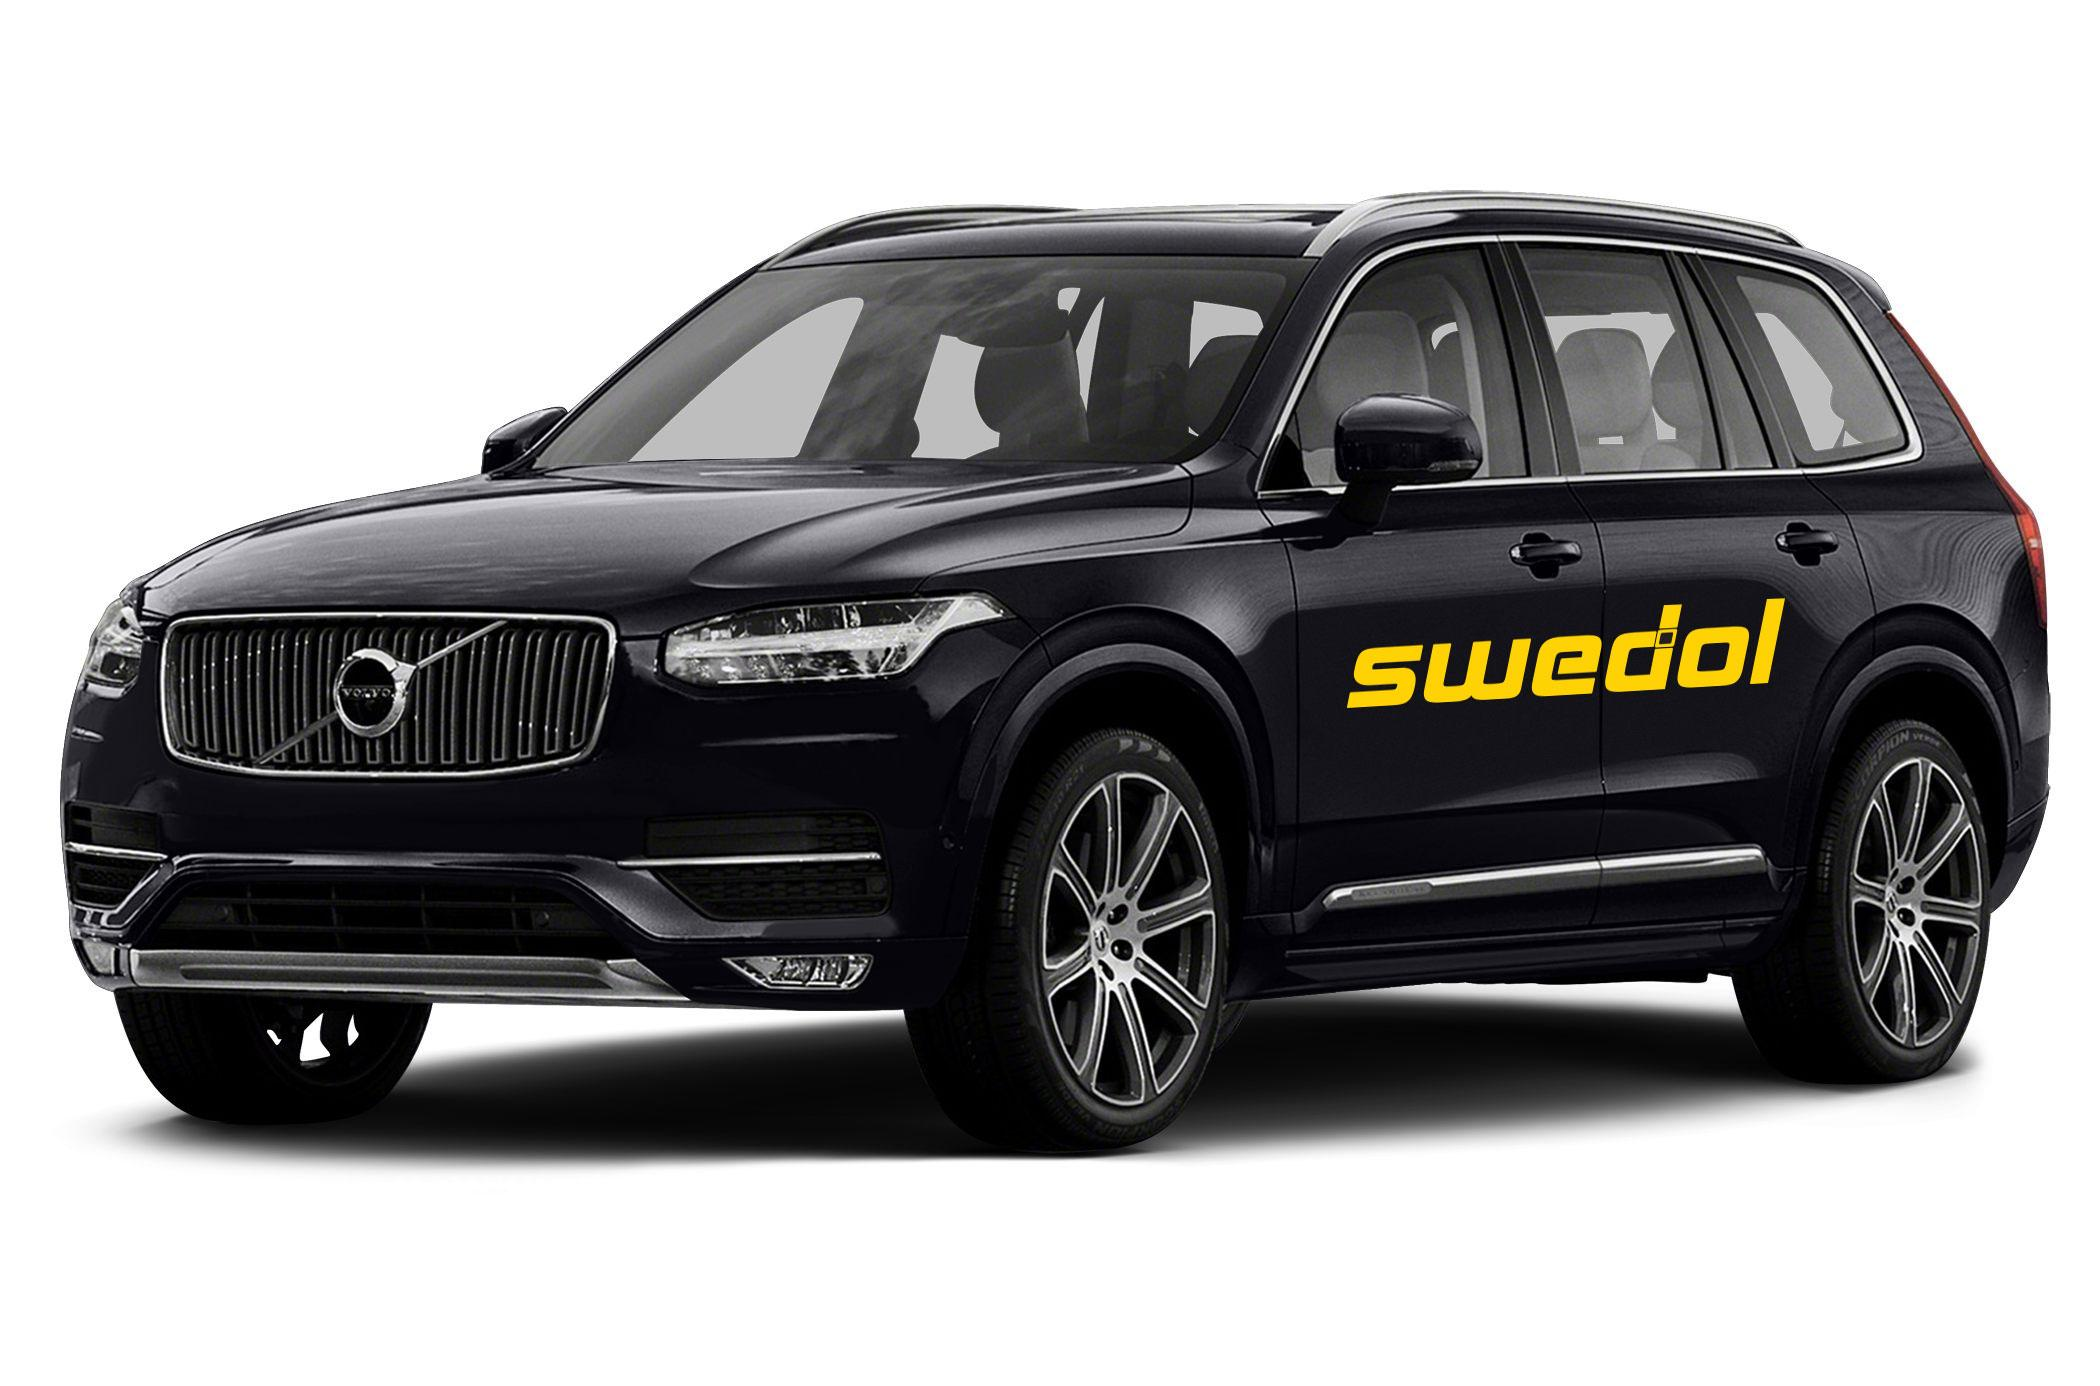 Helt nya Bildekor - bildekaler - bilreklam - text på bilen | Be JT-72